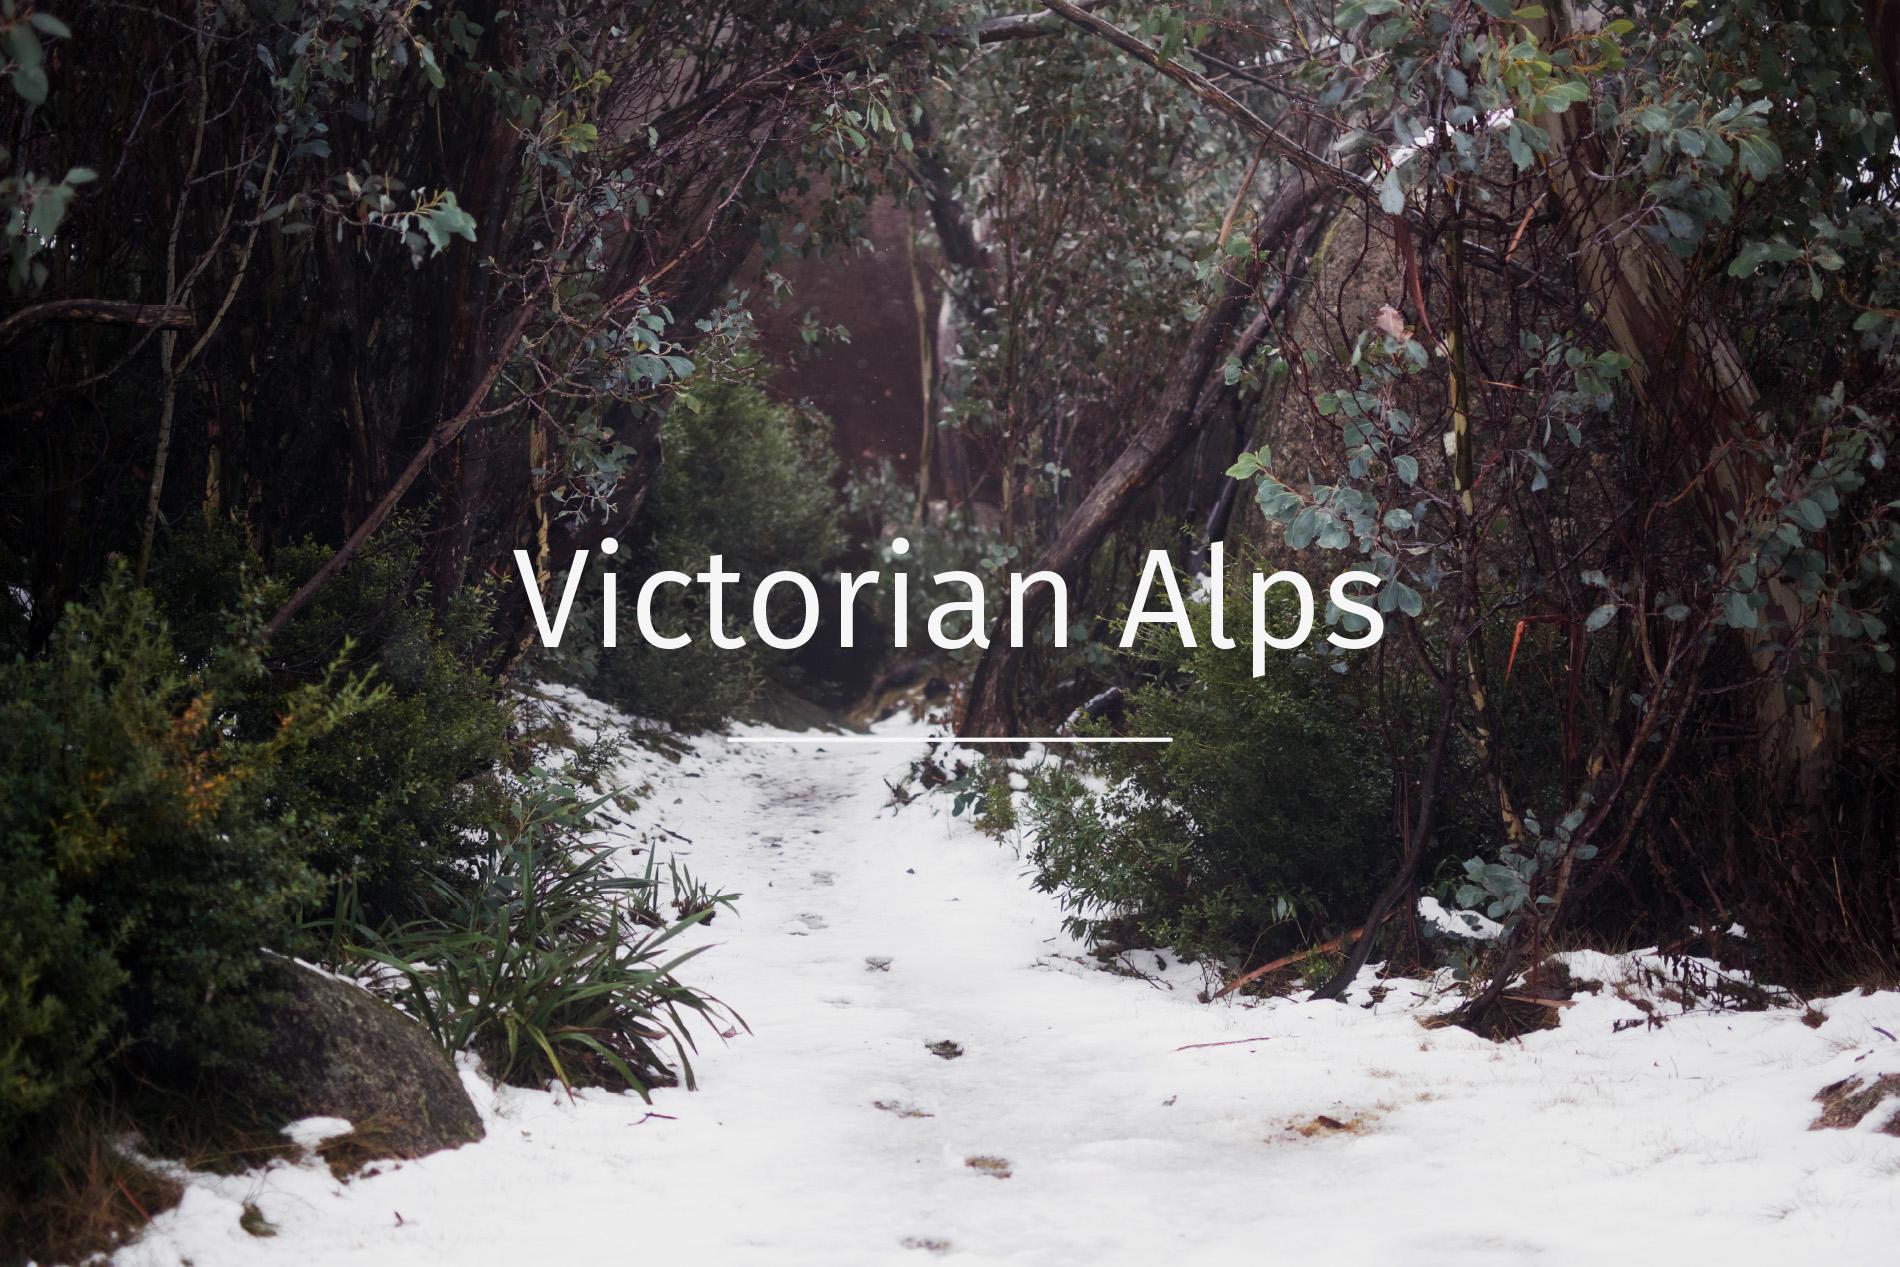 Victorian Alps